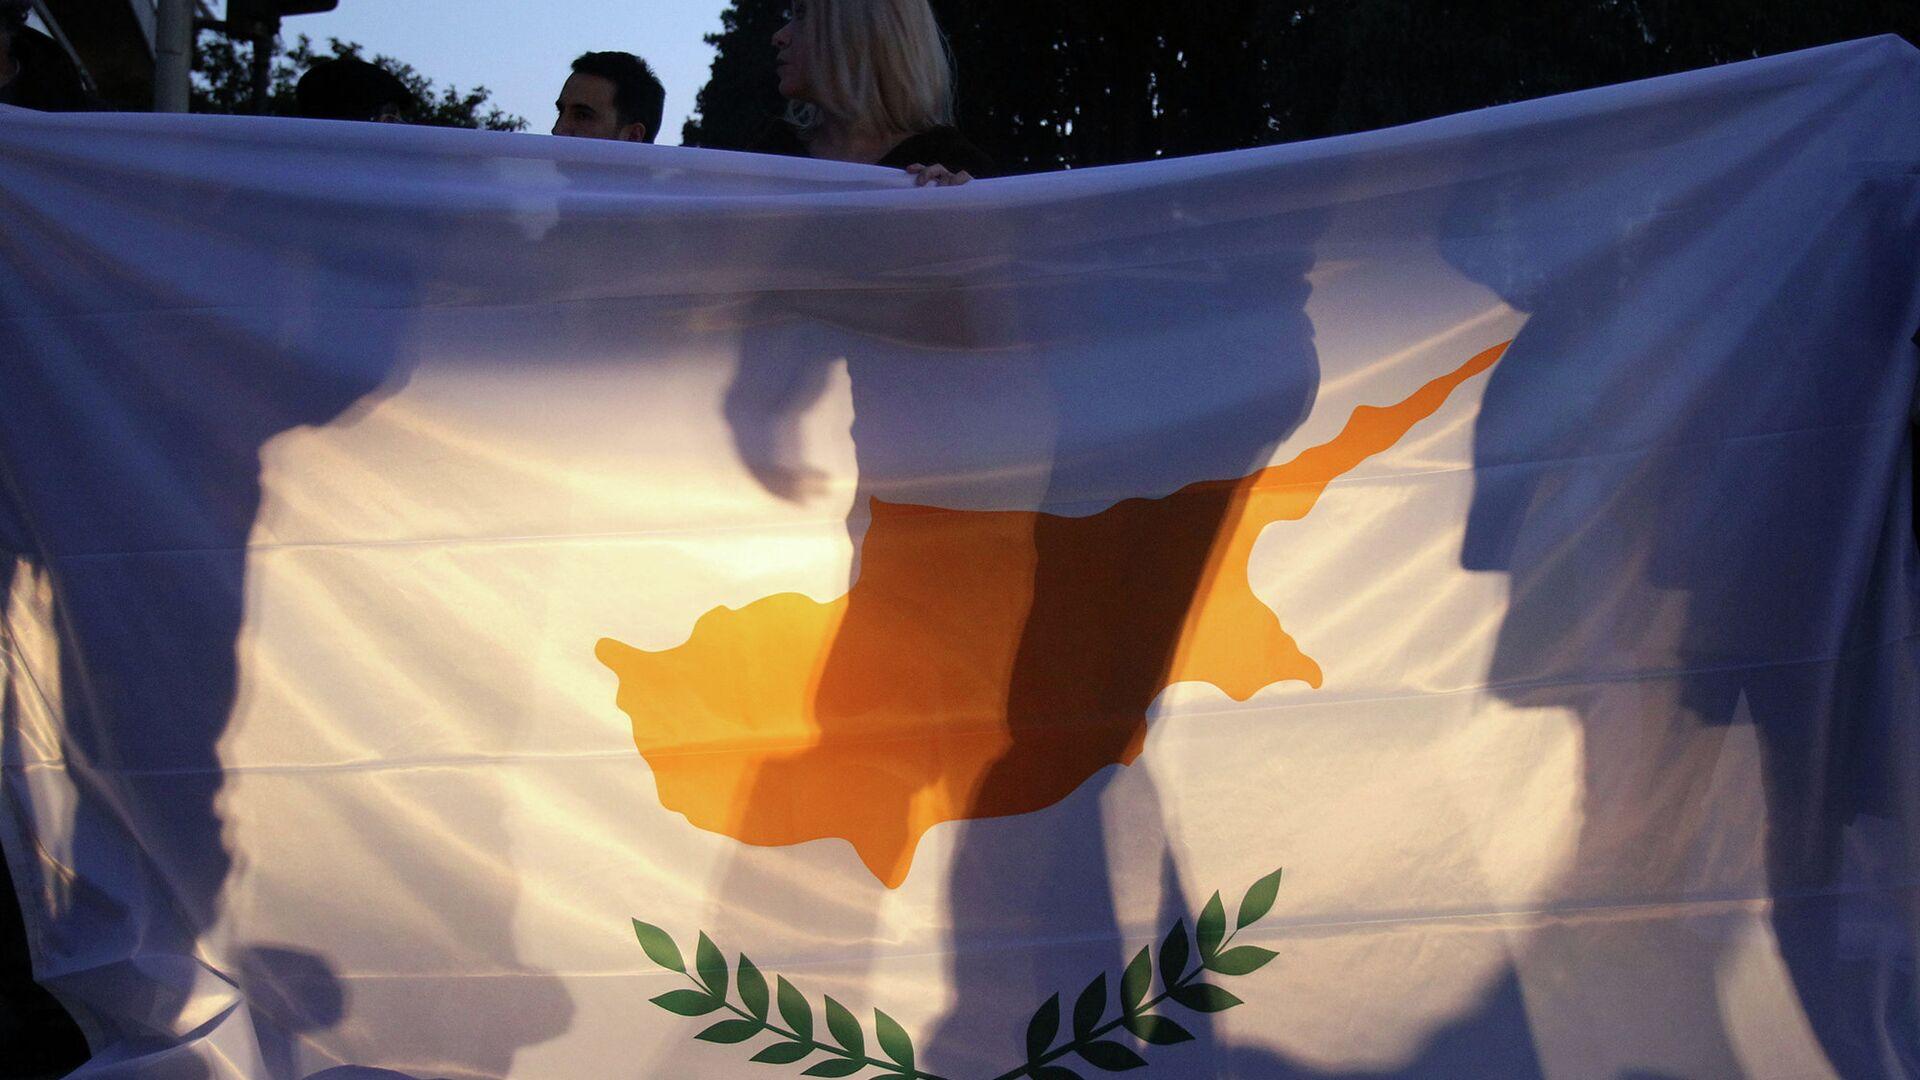 Флаг Кипра - РИА Новости, 1920, 01.11.2020